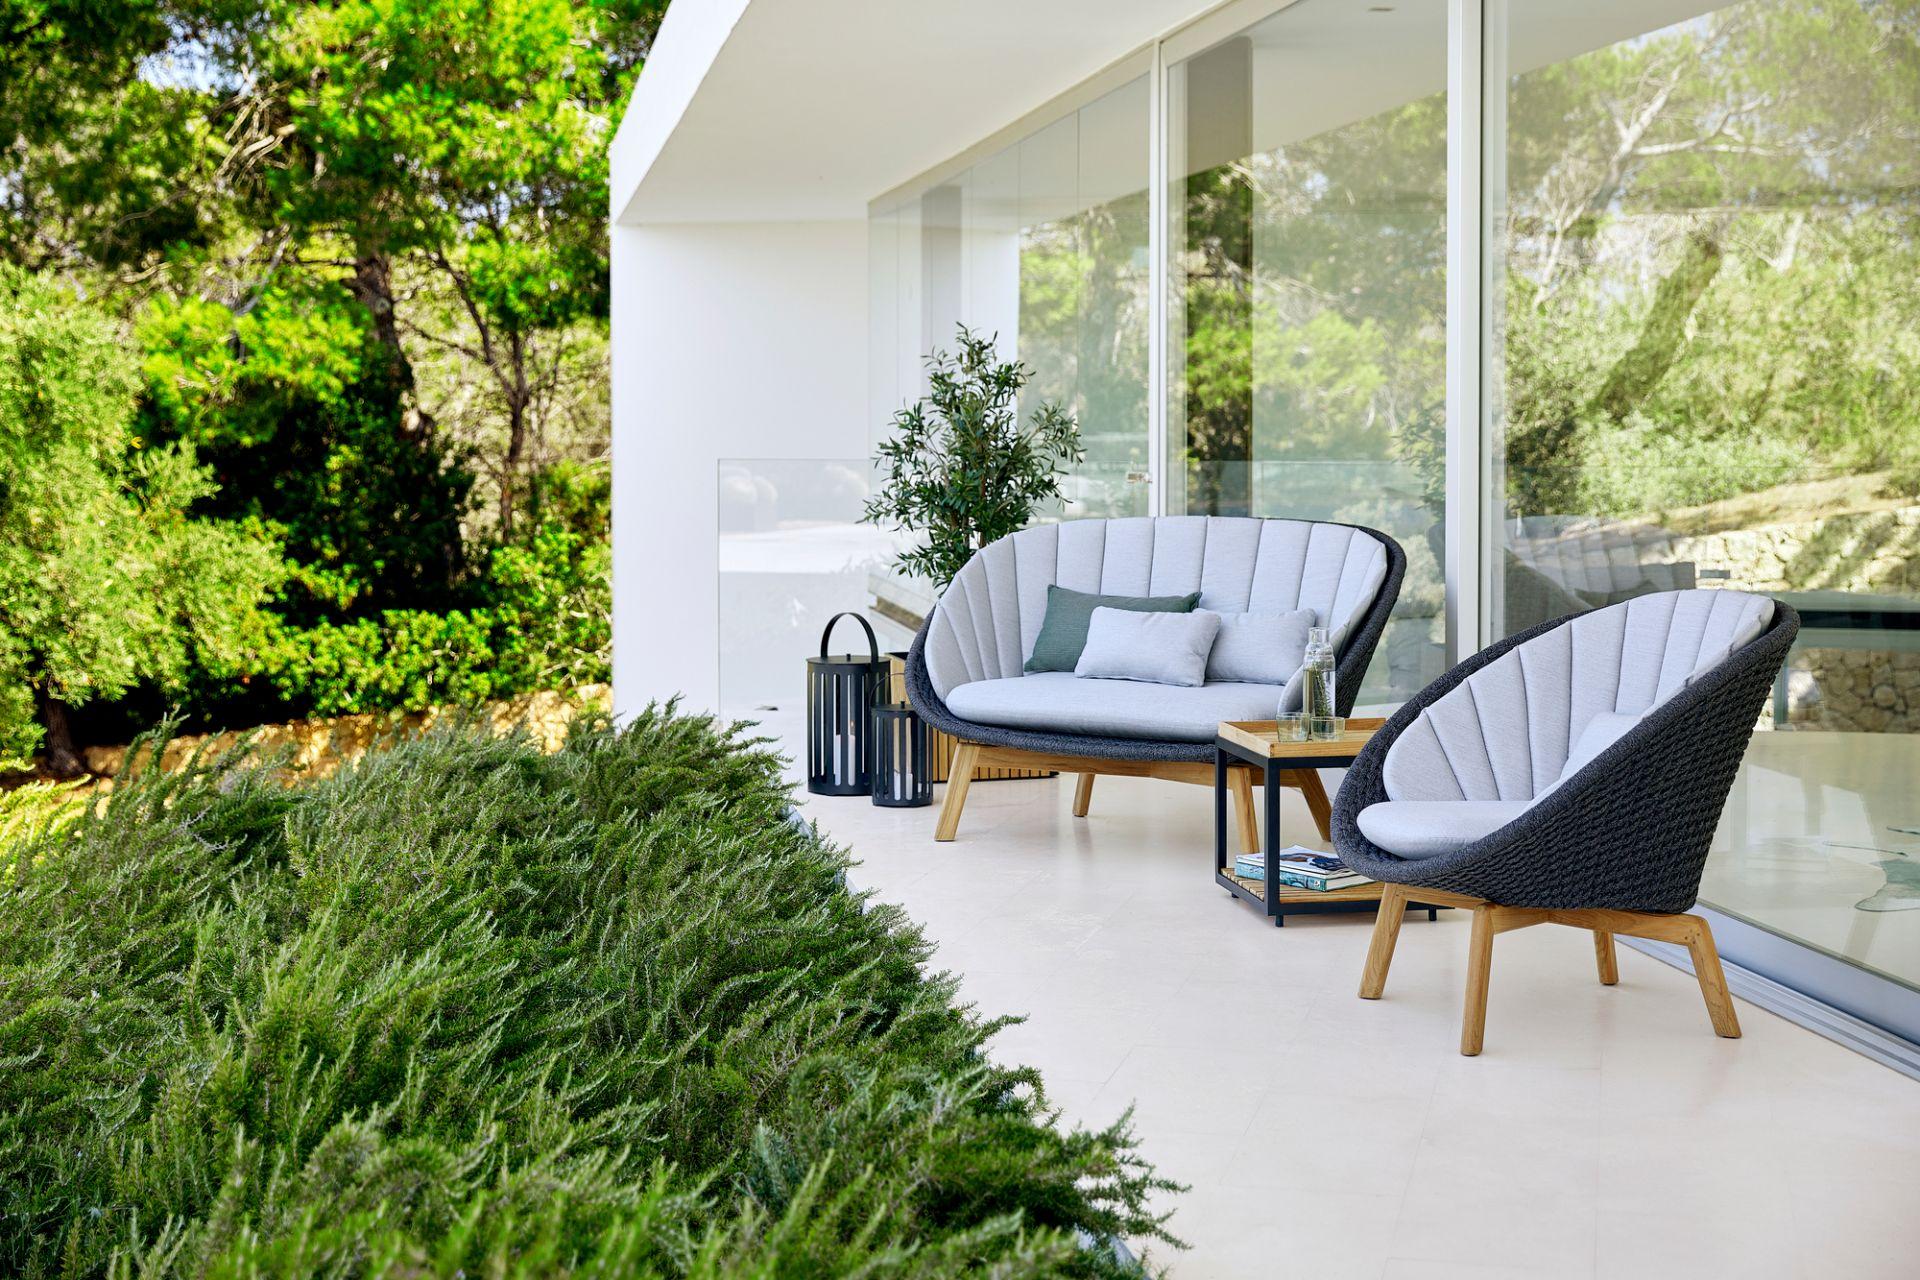 Peacock Outdoor Kissensatz für 2-Sitzer Sofa Cane-Line hellgrau